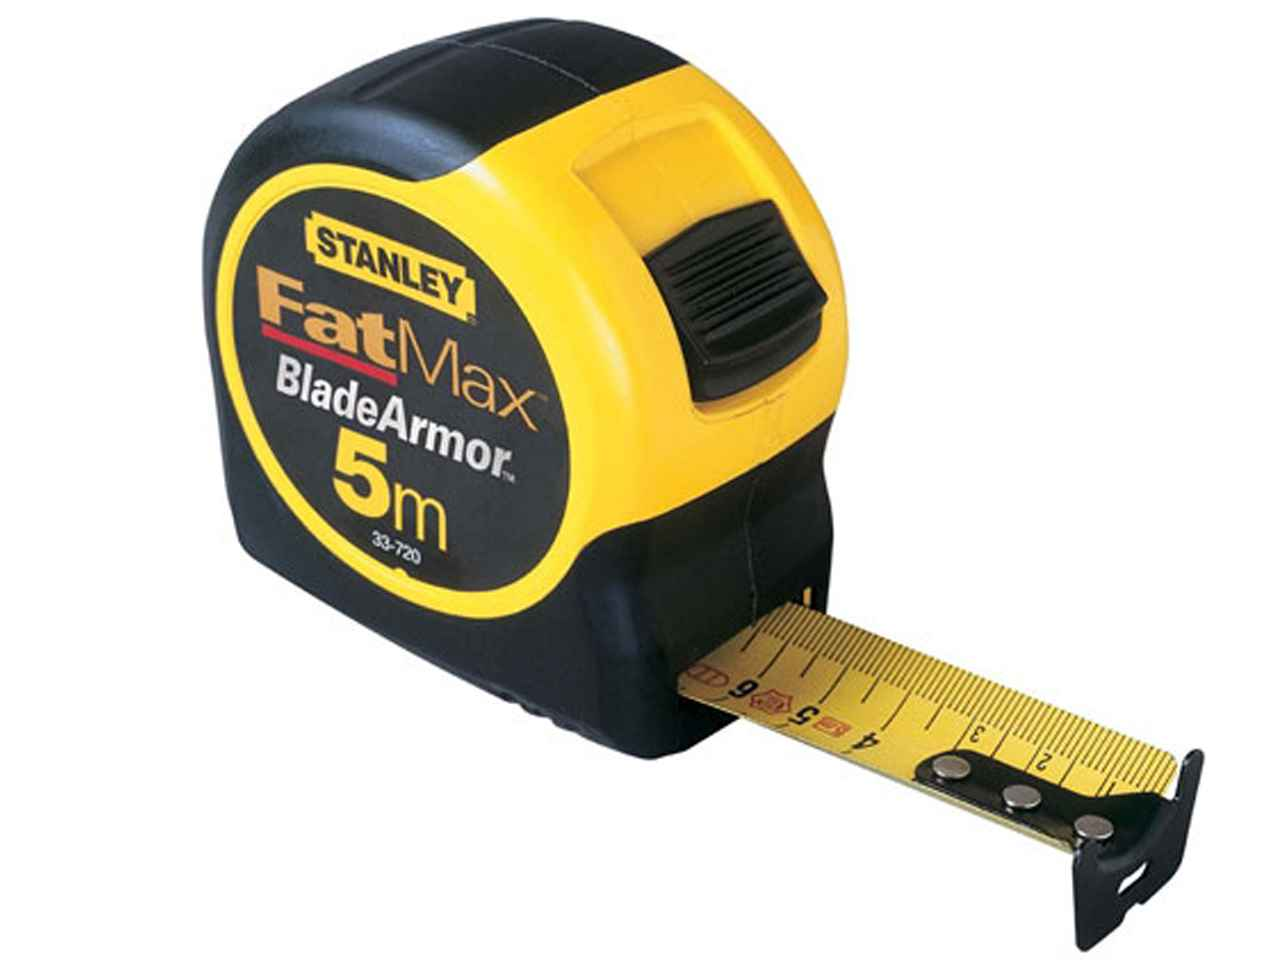 stanley xms16protape fatmax pro tape measure 8m 26ft. Black Bedroom Furniture Sets. Home Design Ideas